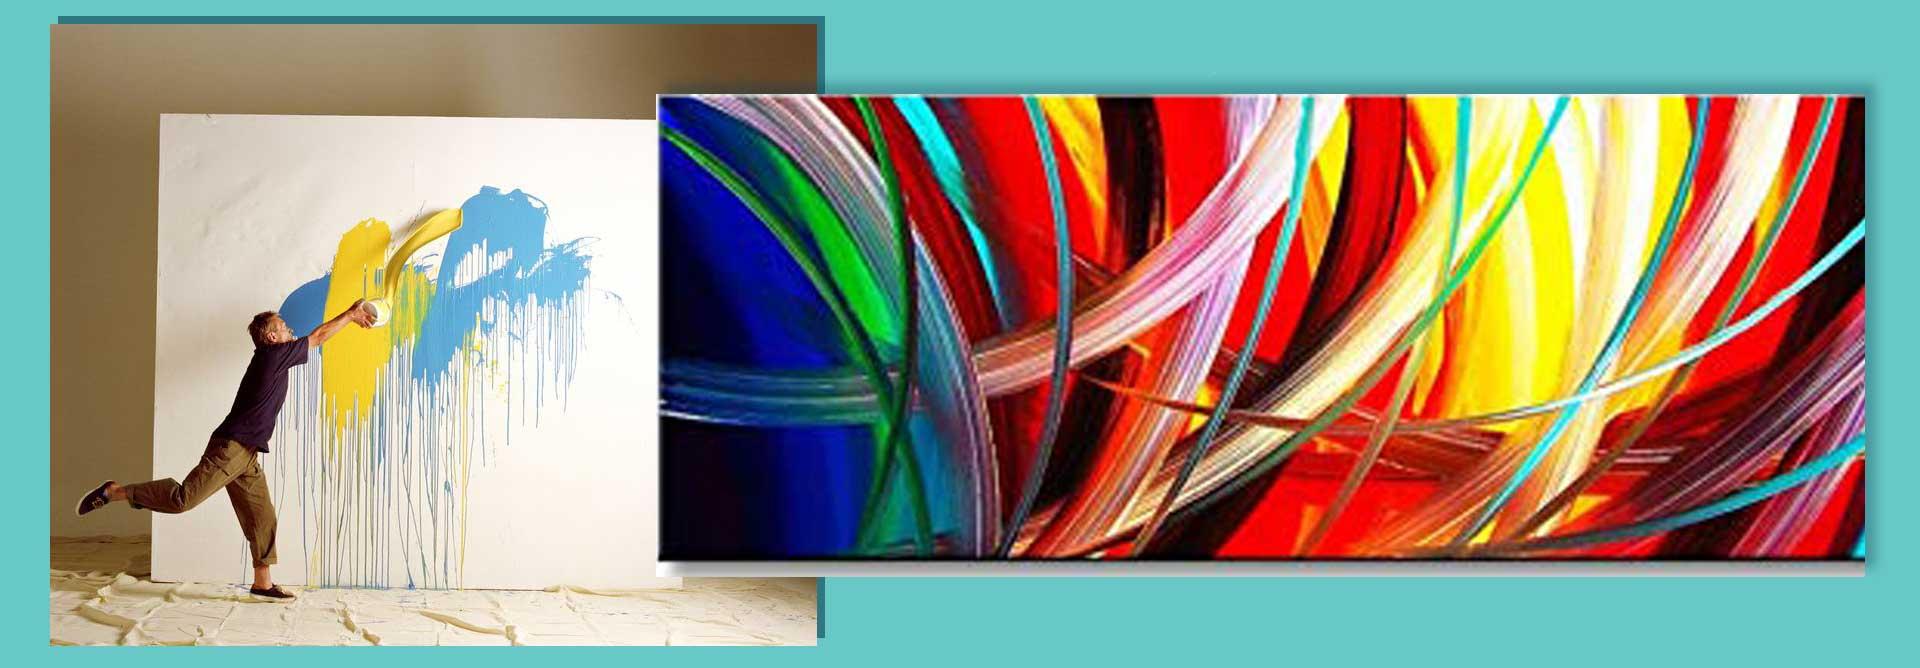 professiona1 photographe 3a - ۹۹ روش برای فروش آثار هنری